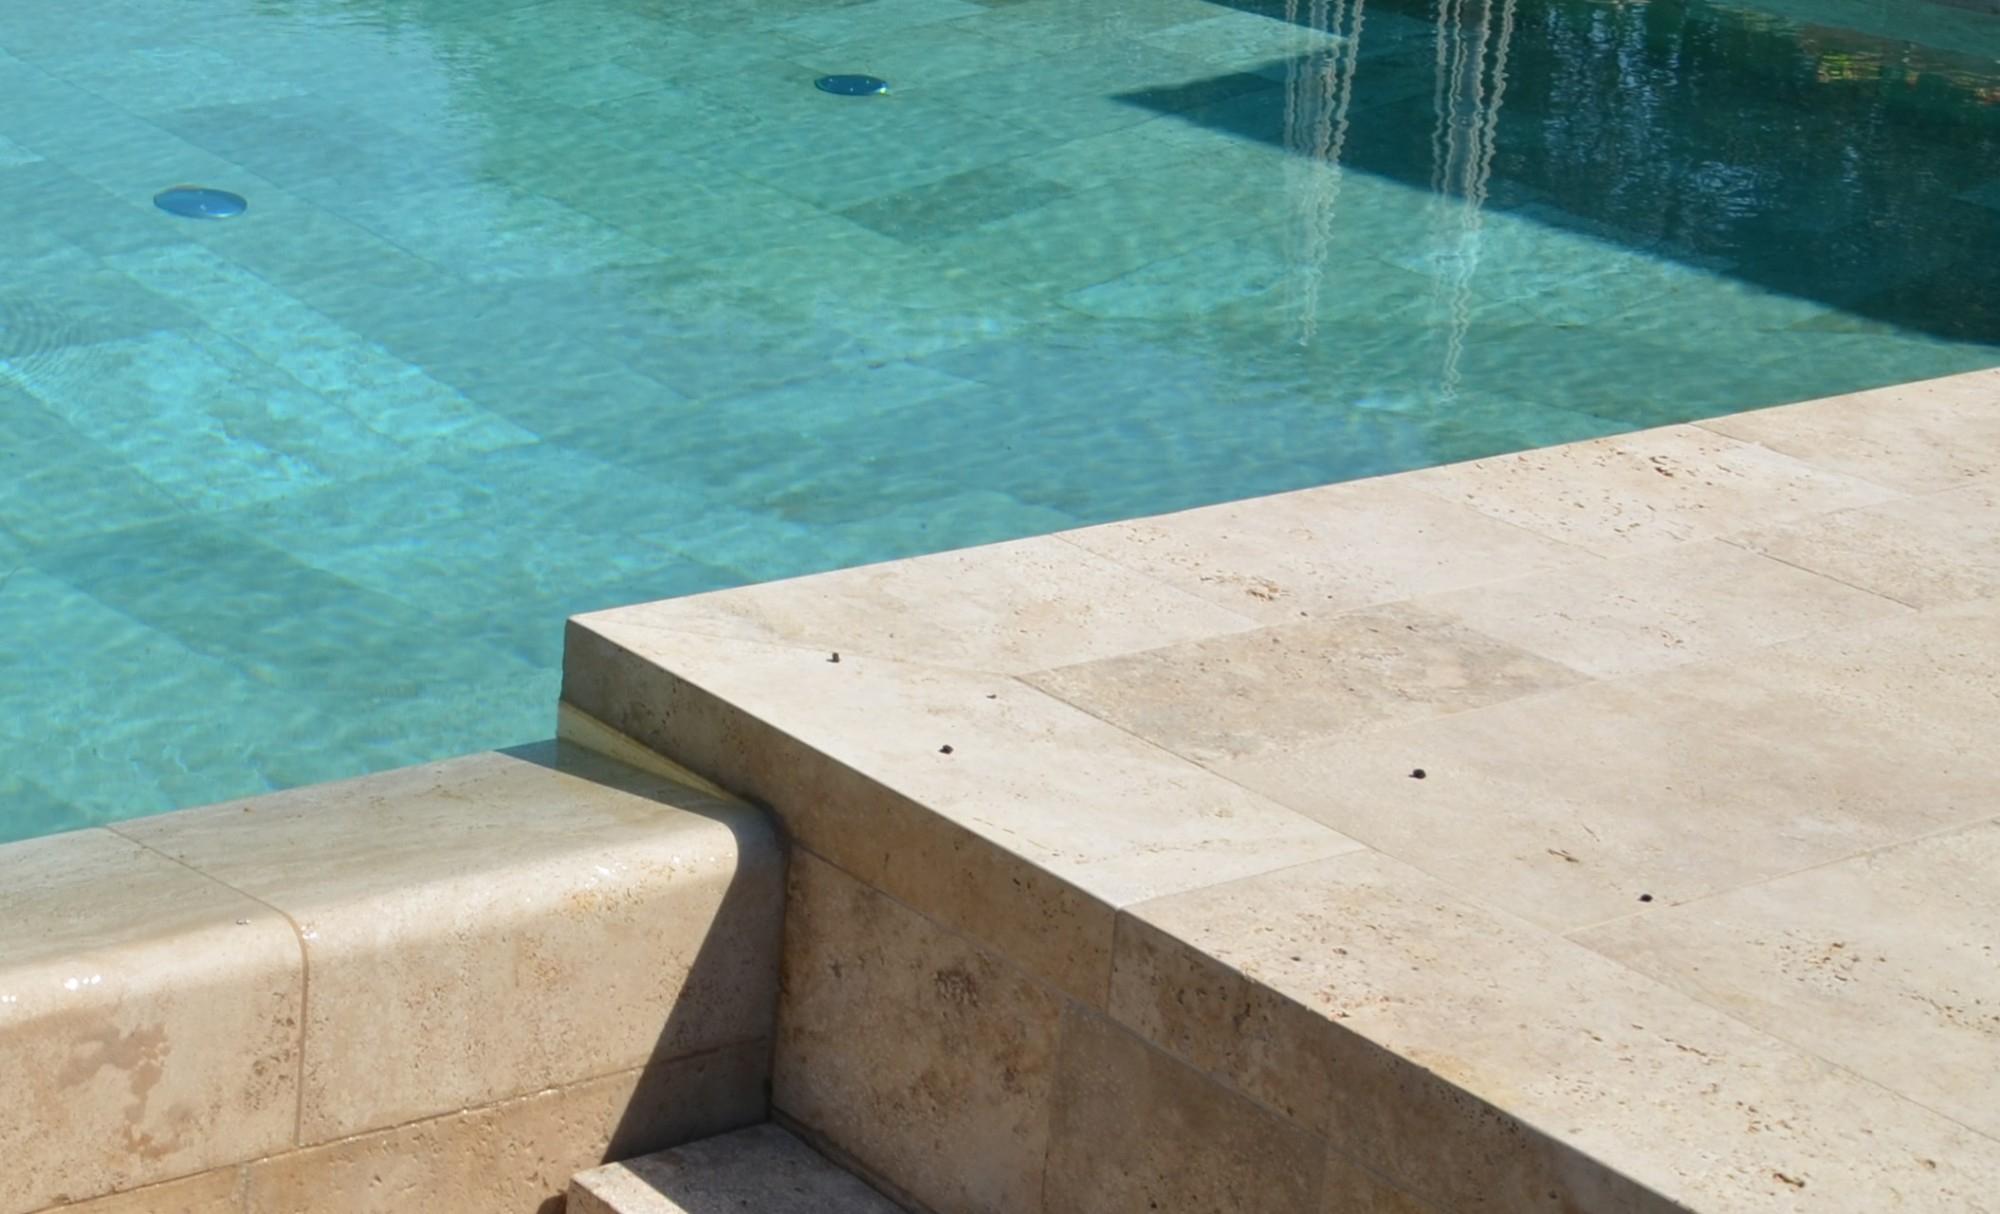 Margelle de piscine travertin beige Grasse Alpes Maritimes